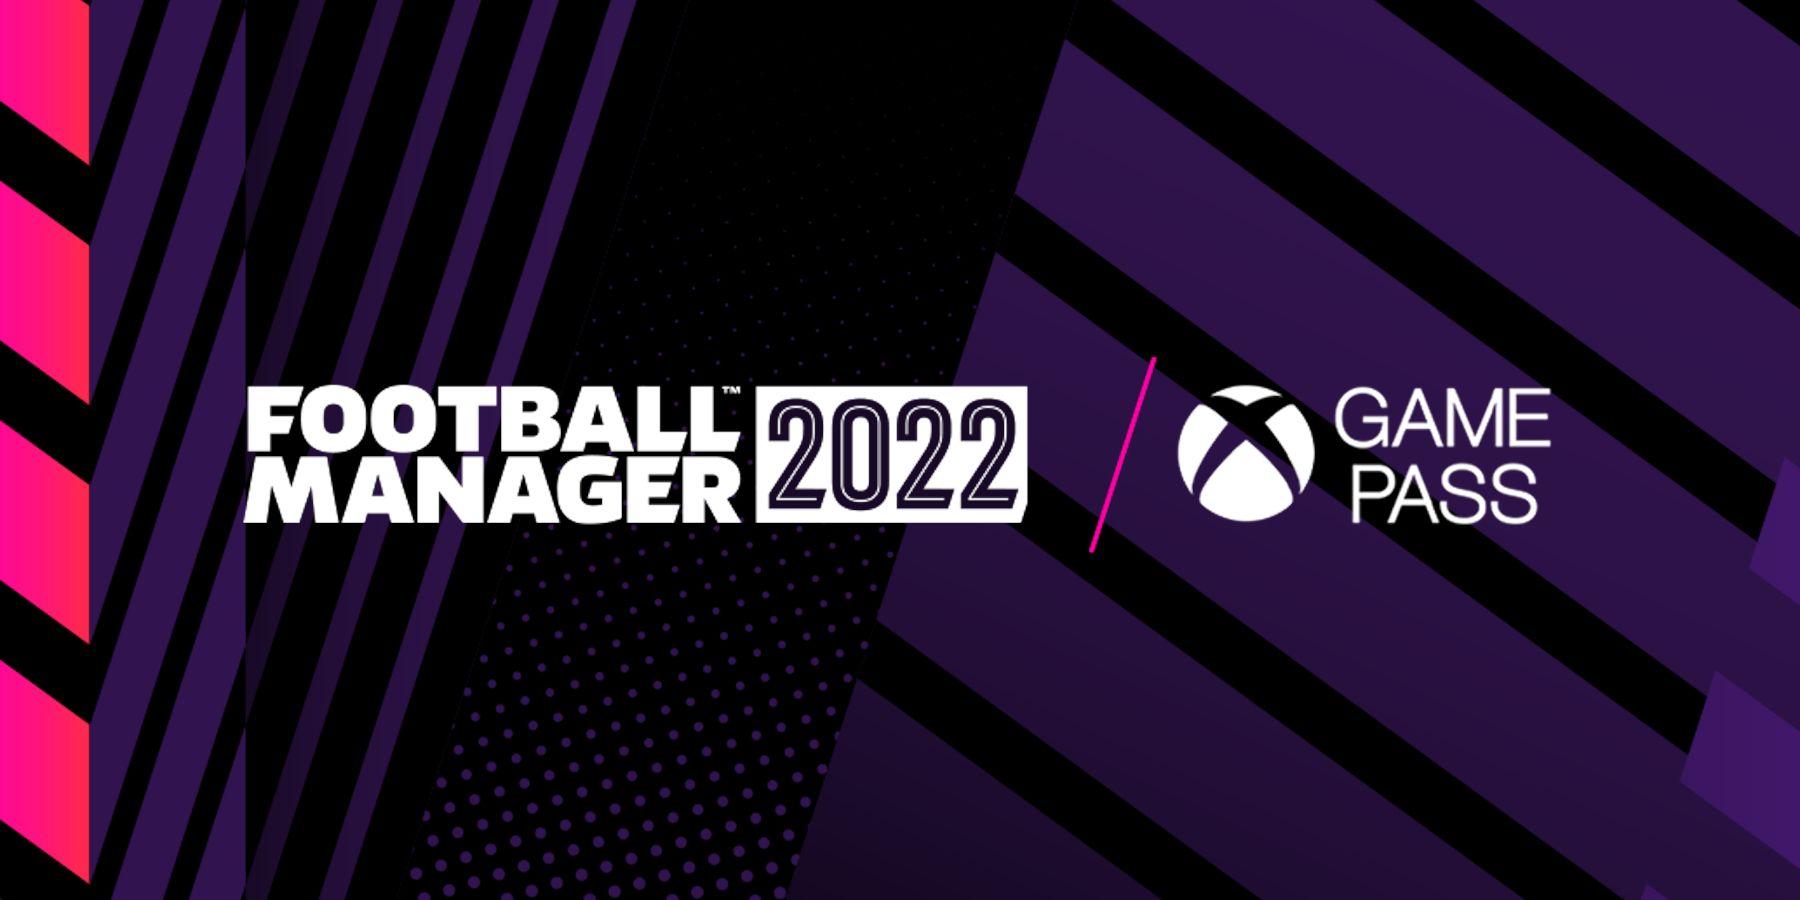 Football Manager 2022 llegará gratis a Xbox Game Pass